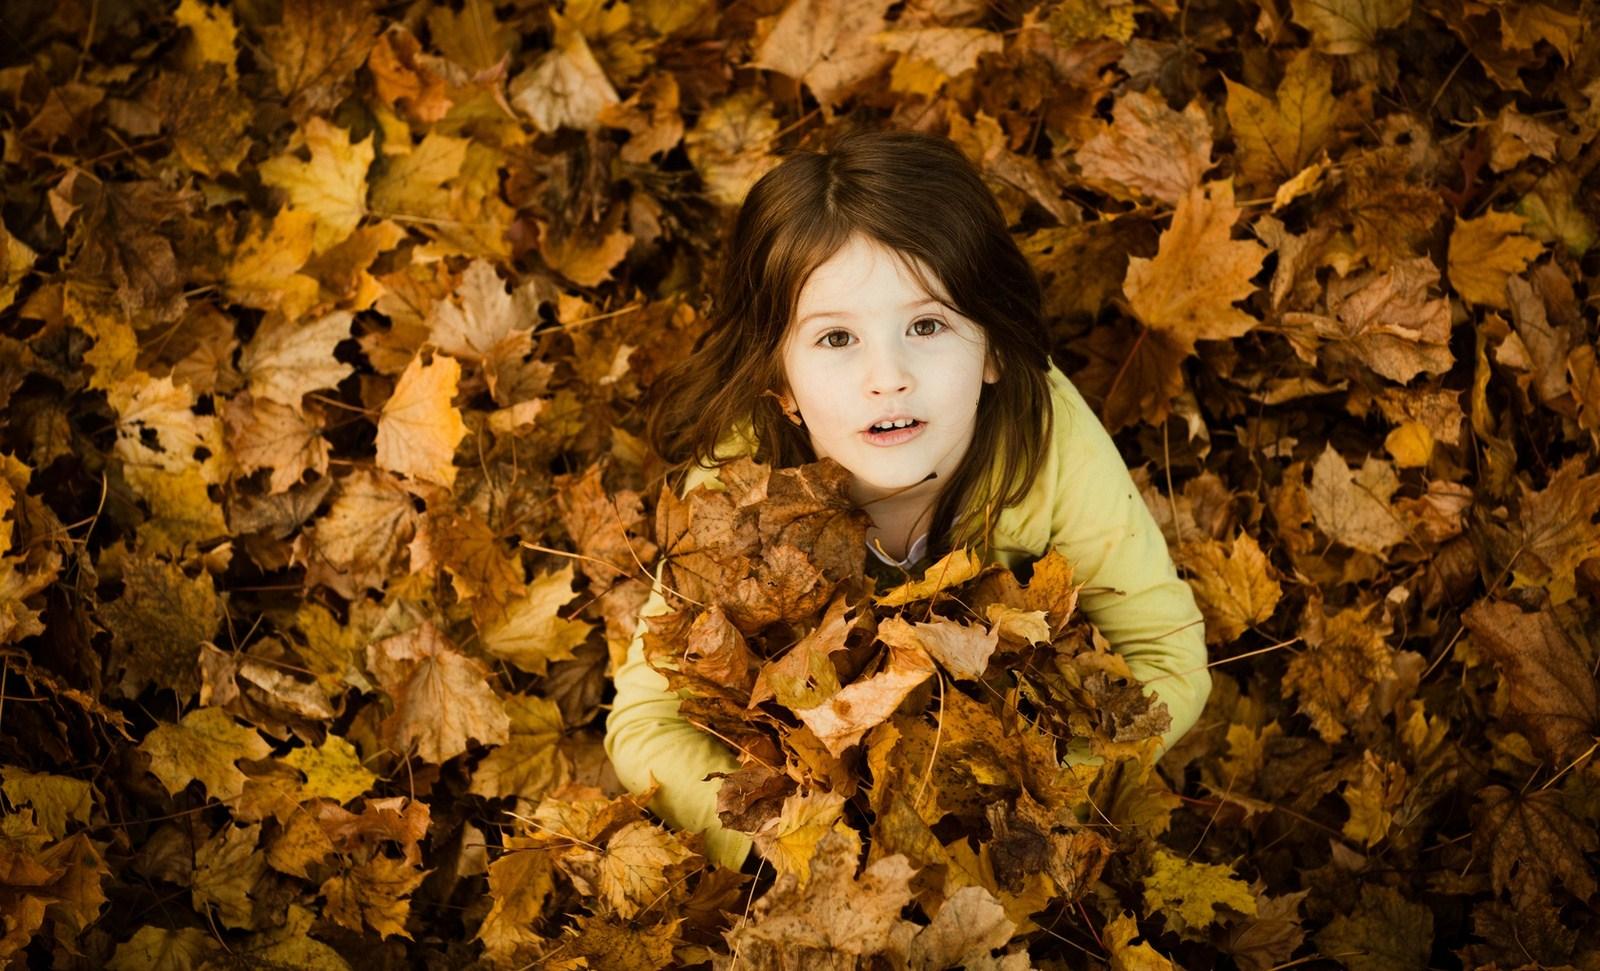 Children Girl Mood Leaves Smiling Autumn Yellow Hd Wallpaper 1600x971